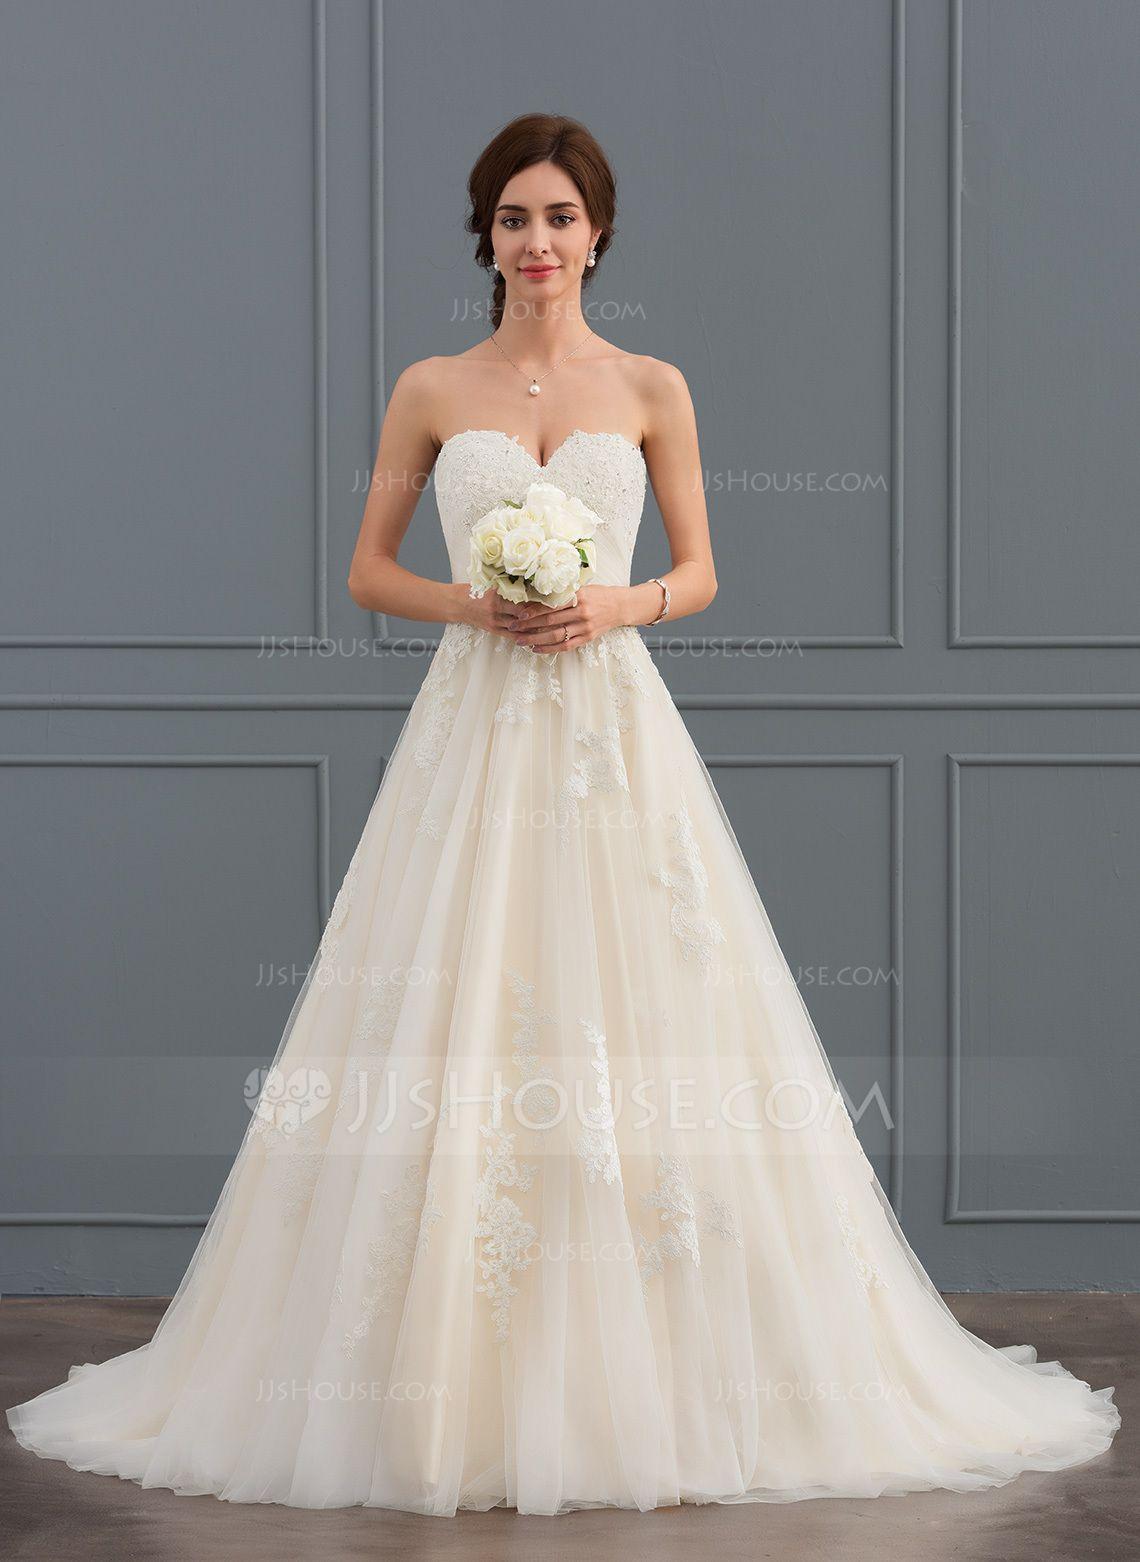 Jjshouse Ball Gown Sweetheart Court Train Tulle Wedding Dress With Ruffle Beading Plus Wedding Dresses Wedding Dresses Lace Weddings